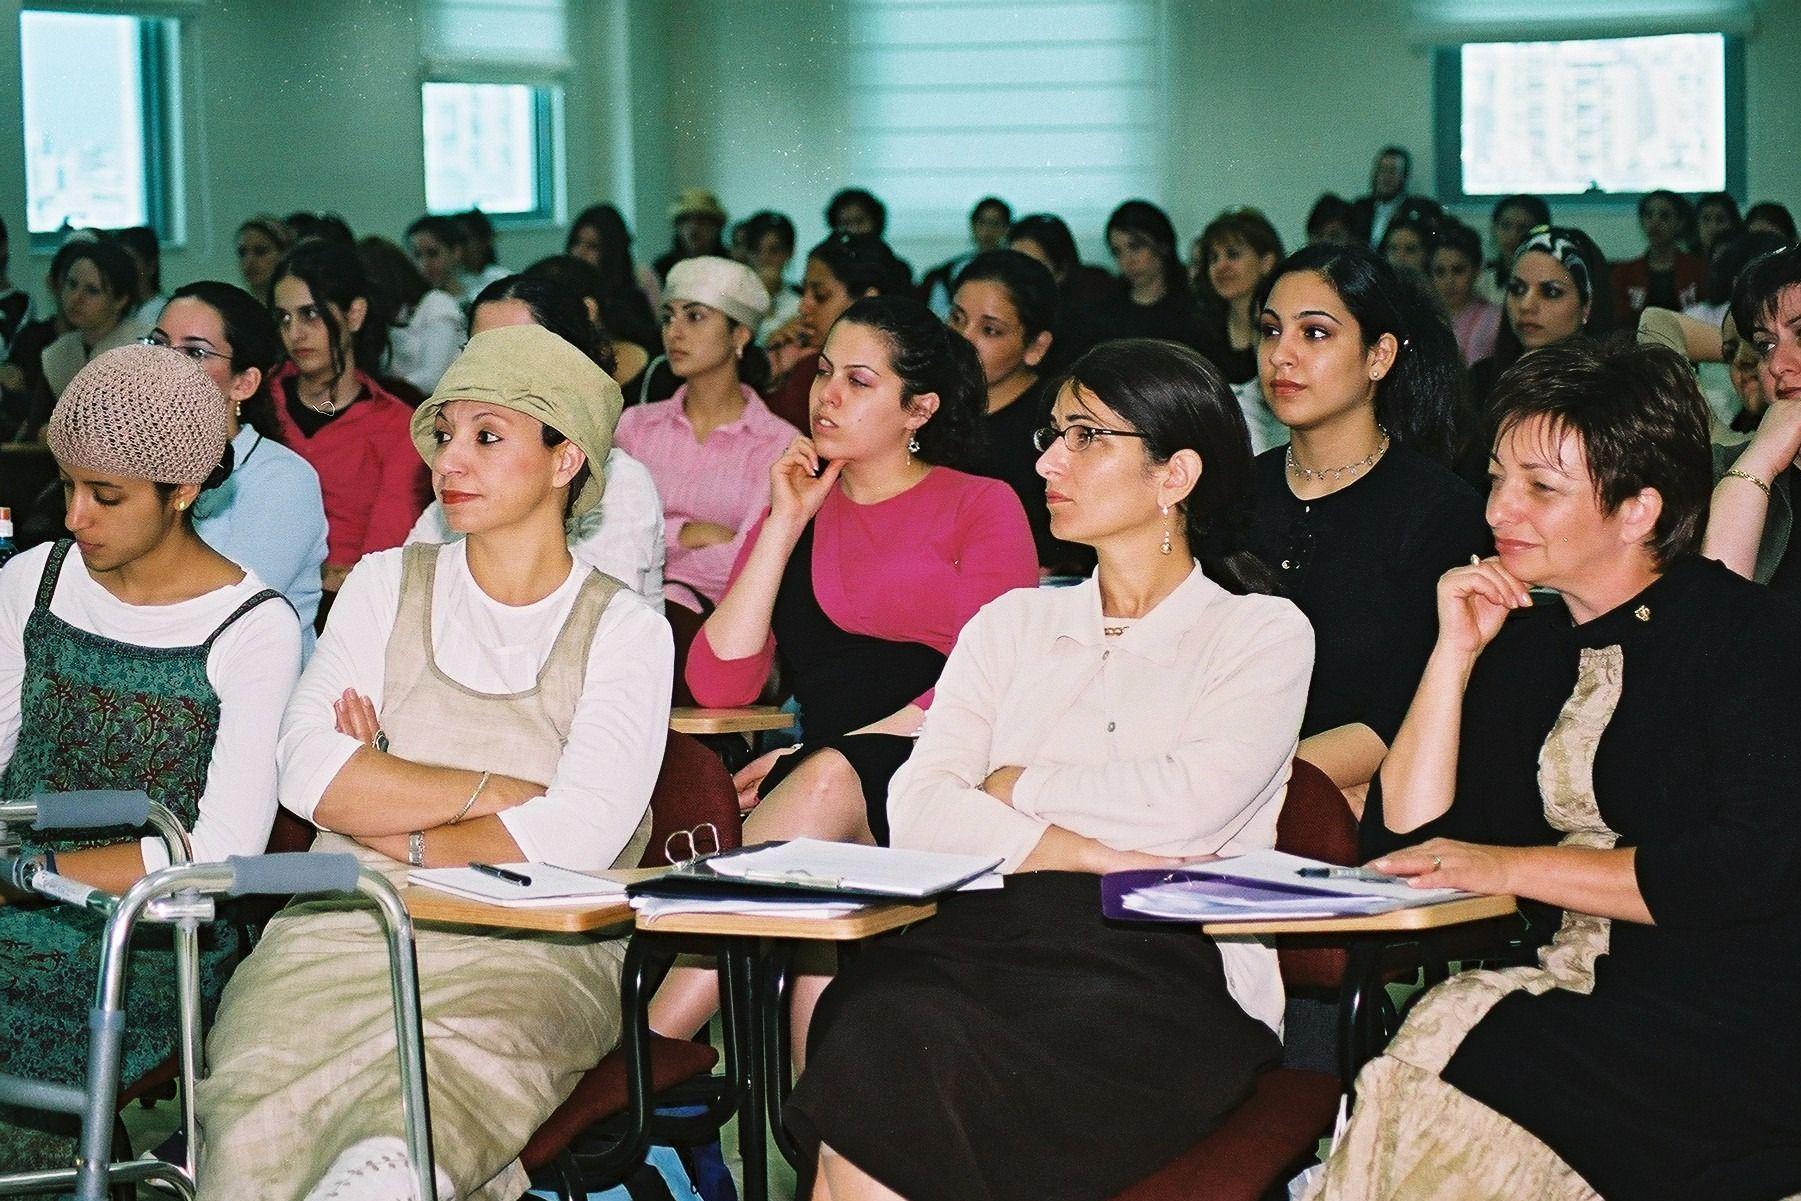 Haredi women at the Kiryat Ono College in Israel.